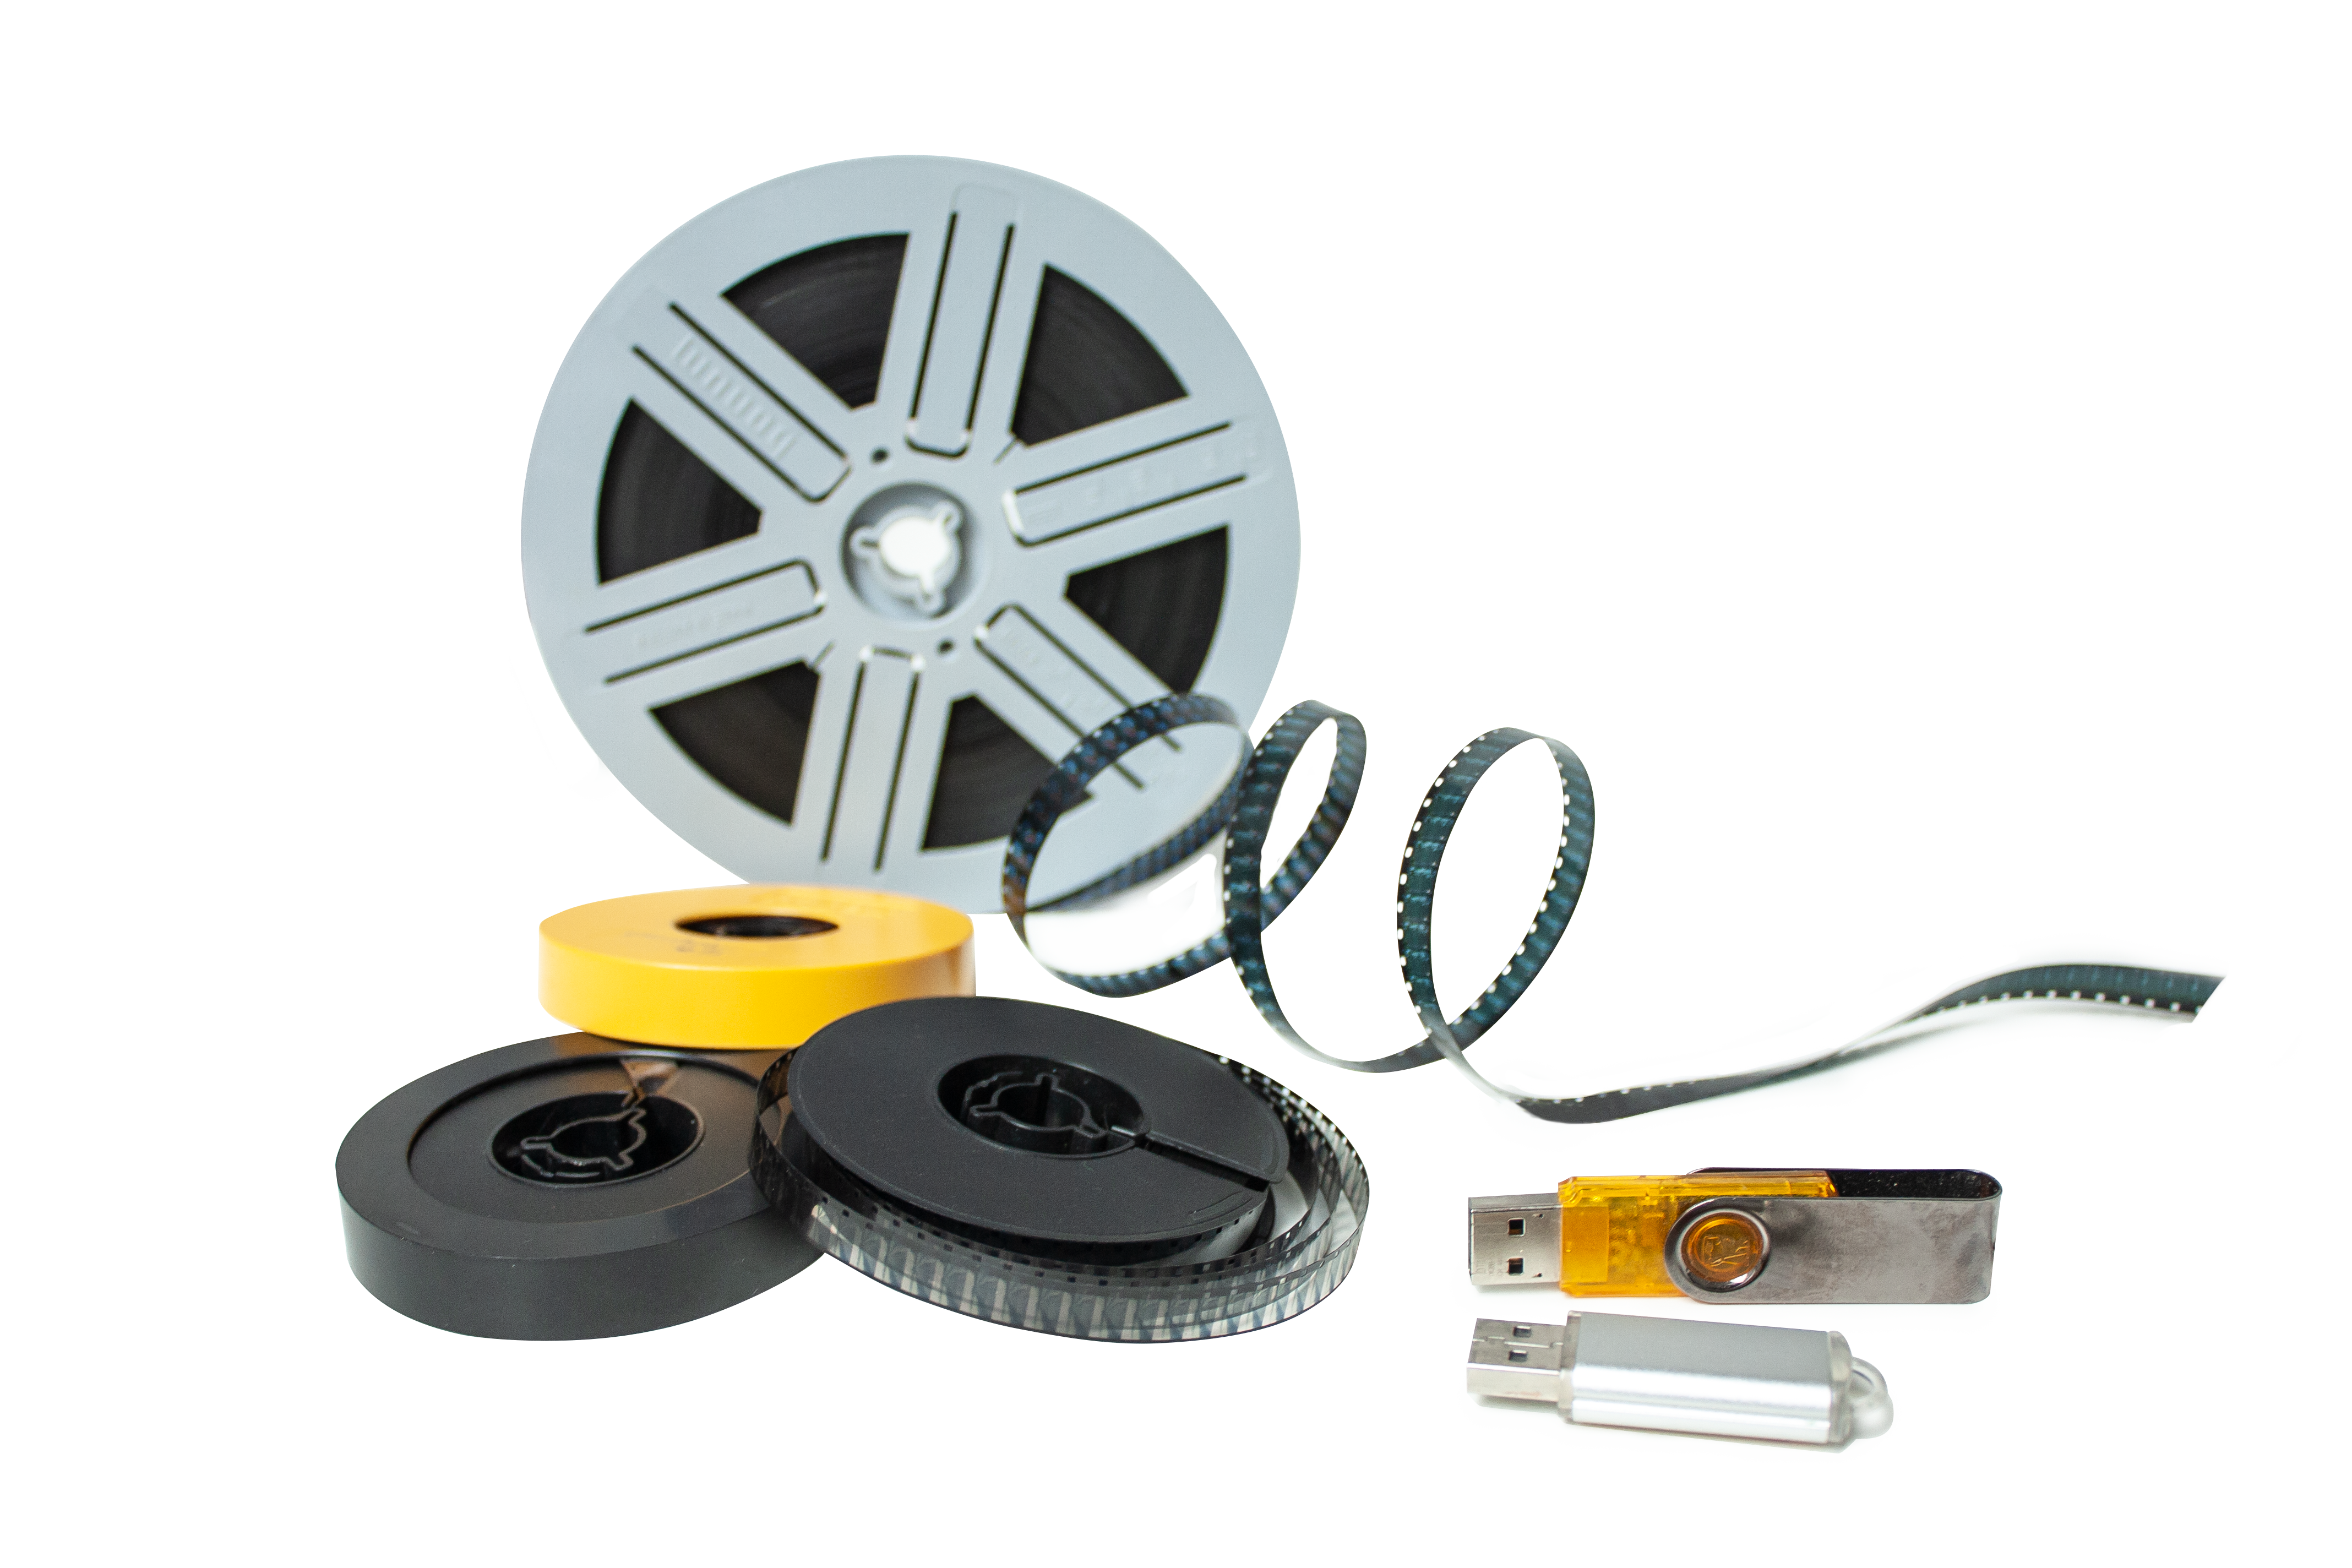 8mm film rolls